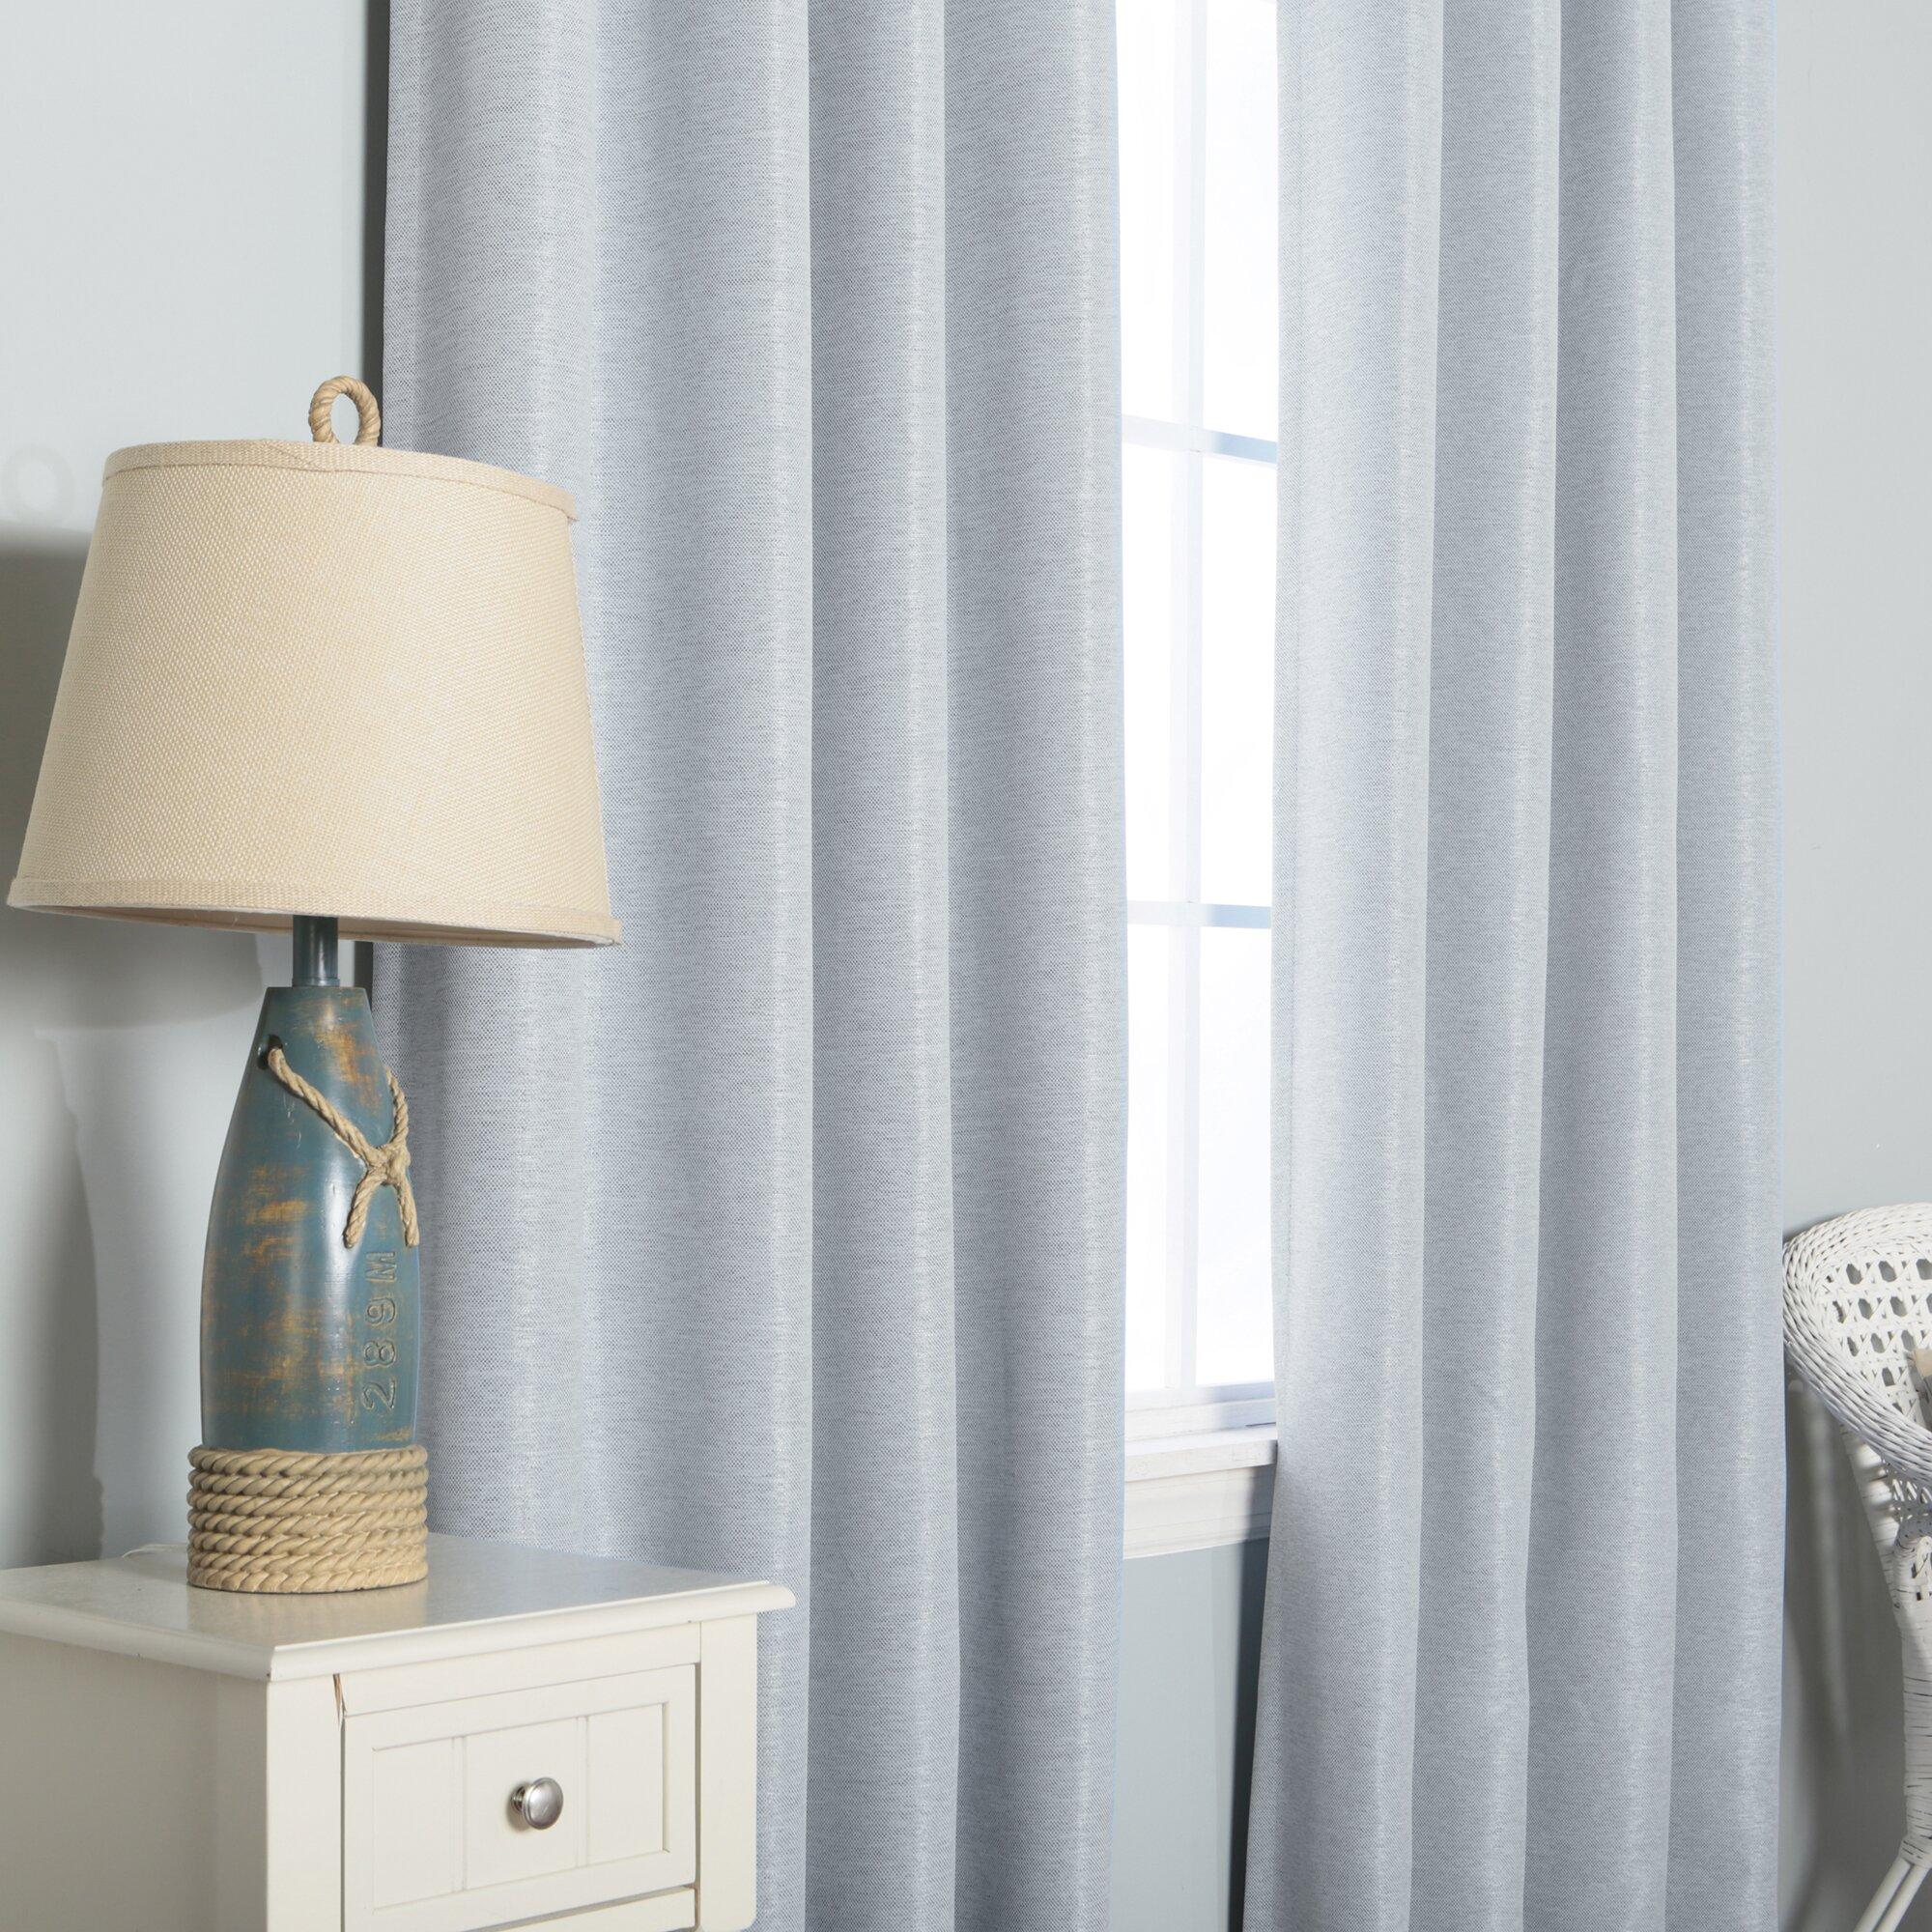 Best Home Fashion Inc Shimmery Basketweave Grommet Top Blackout Curtain Panels Reviews Wayfair